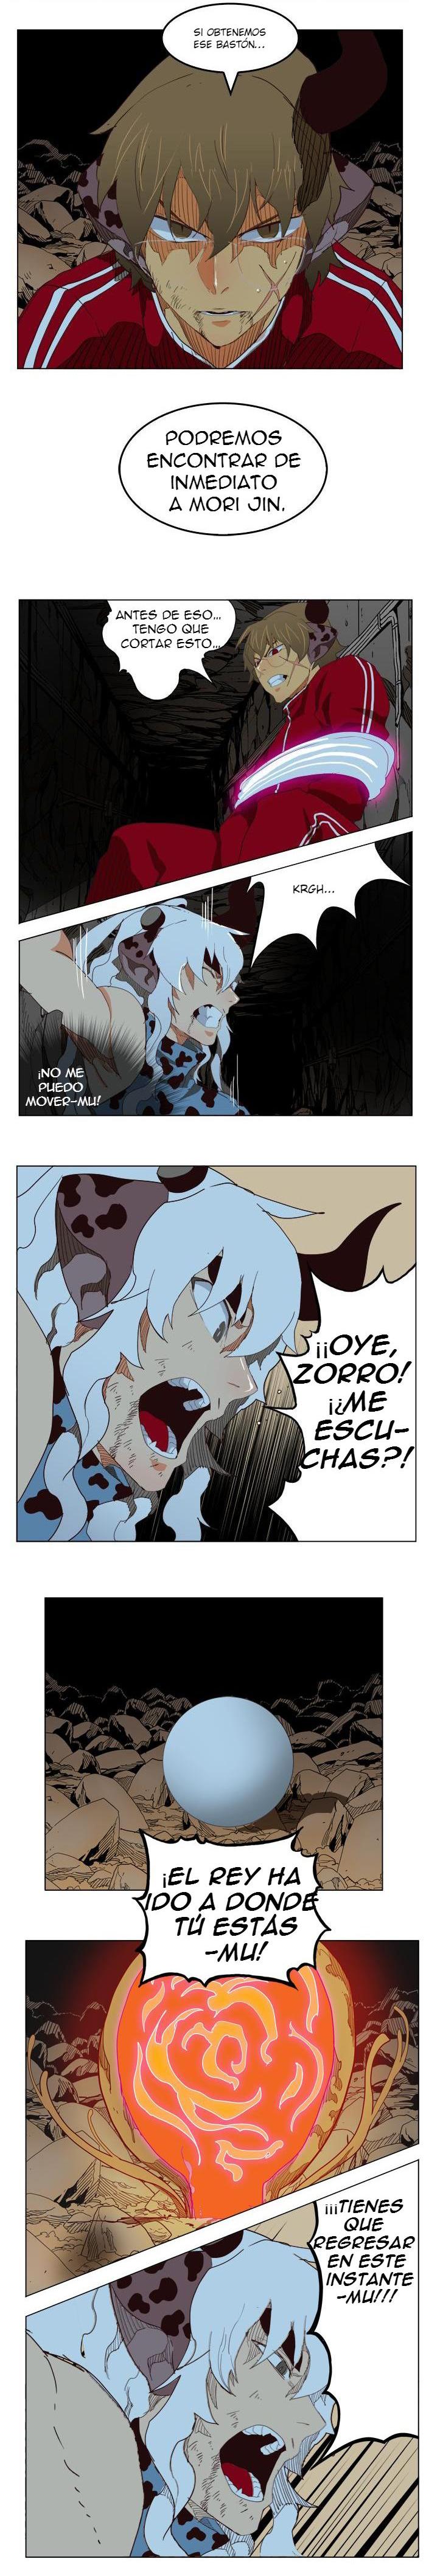 http://c5.ninemanga.com/es_manga/37/485/436625/fb87b2e408f0154517a2c59bd946ff50.jpg Page 9